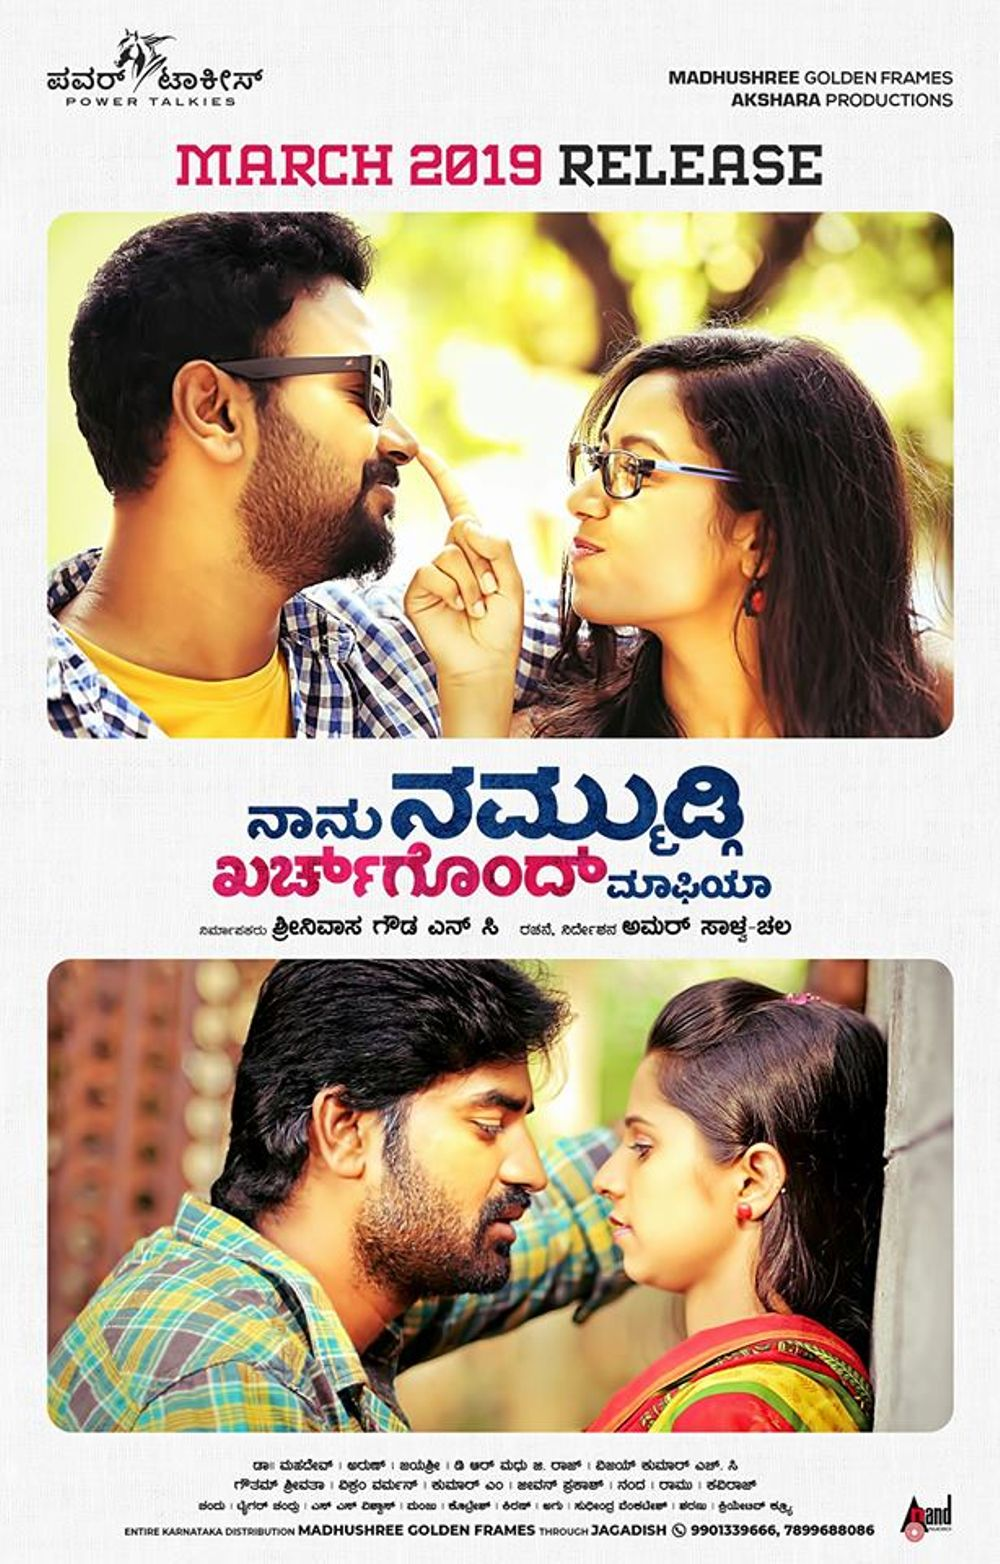 Naanu Nammudgi Kharchgondh Mafia Movie Review Kannada Movie Review